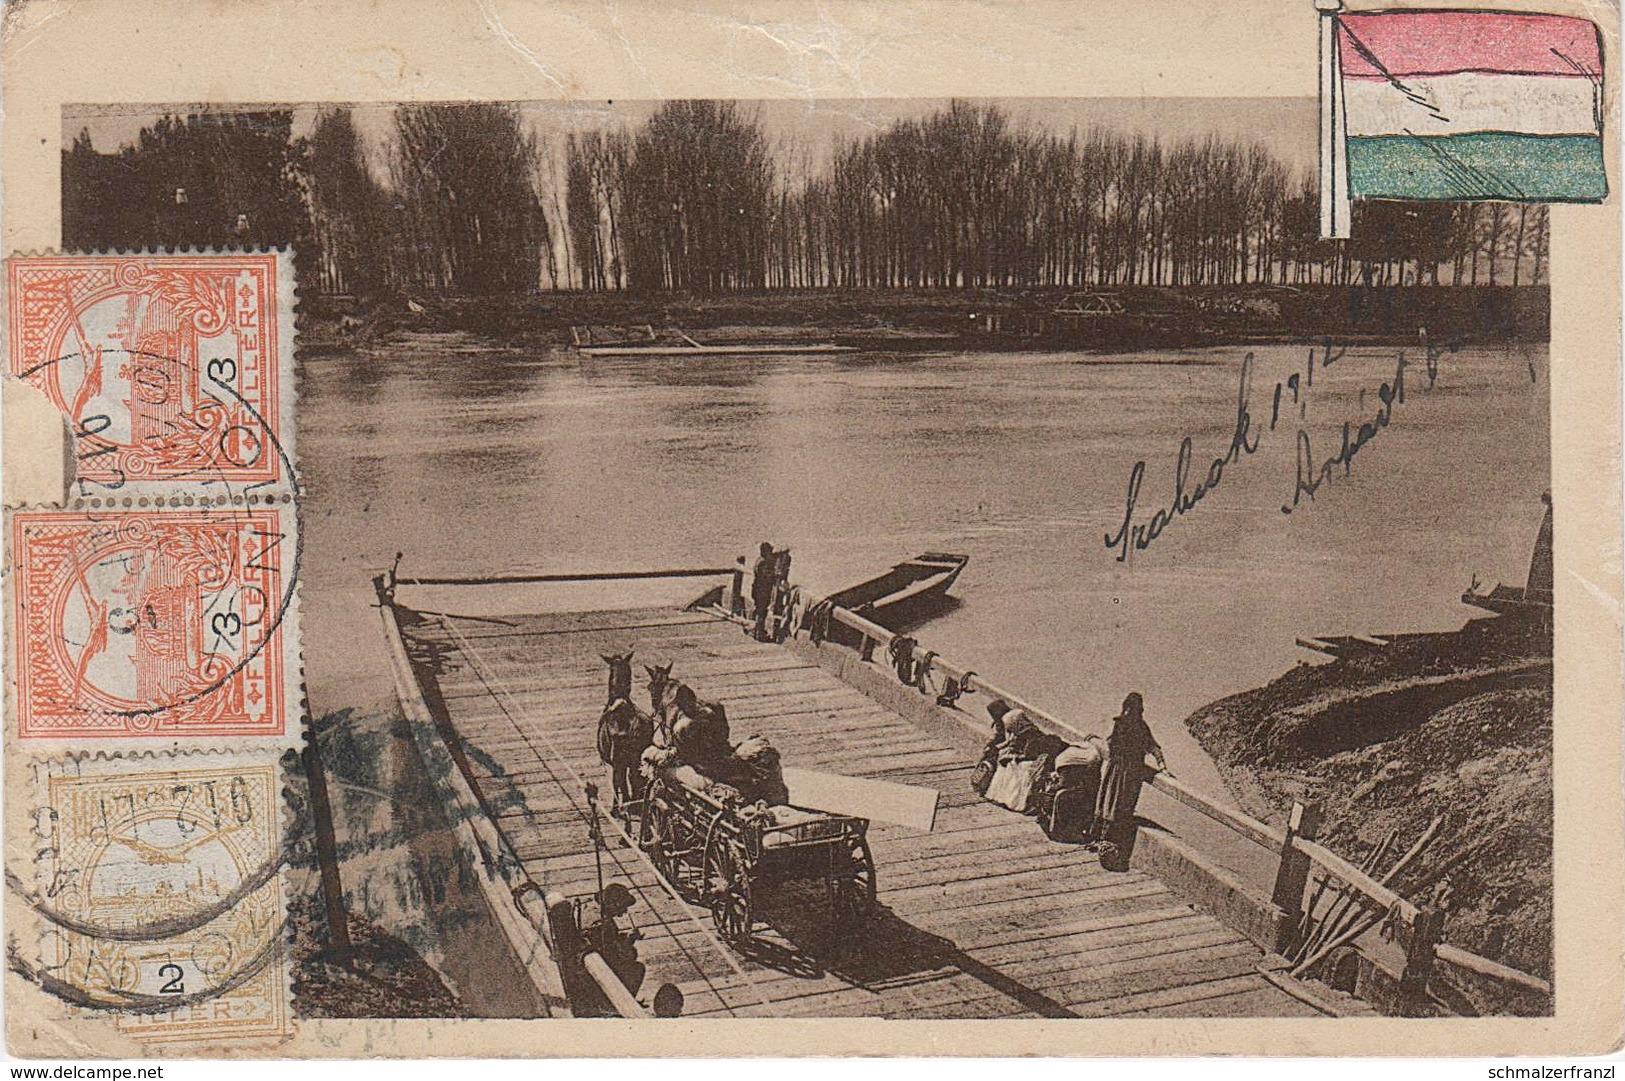 AK Szolnok Sollnock Tiszai Komp Theiß Fähre Bac Ferry A Abony Cegled Österreich Ungarn Magyarorszag Hongrie Hungaria - Ungarn